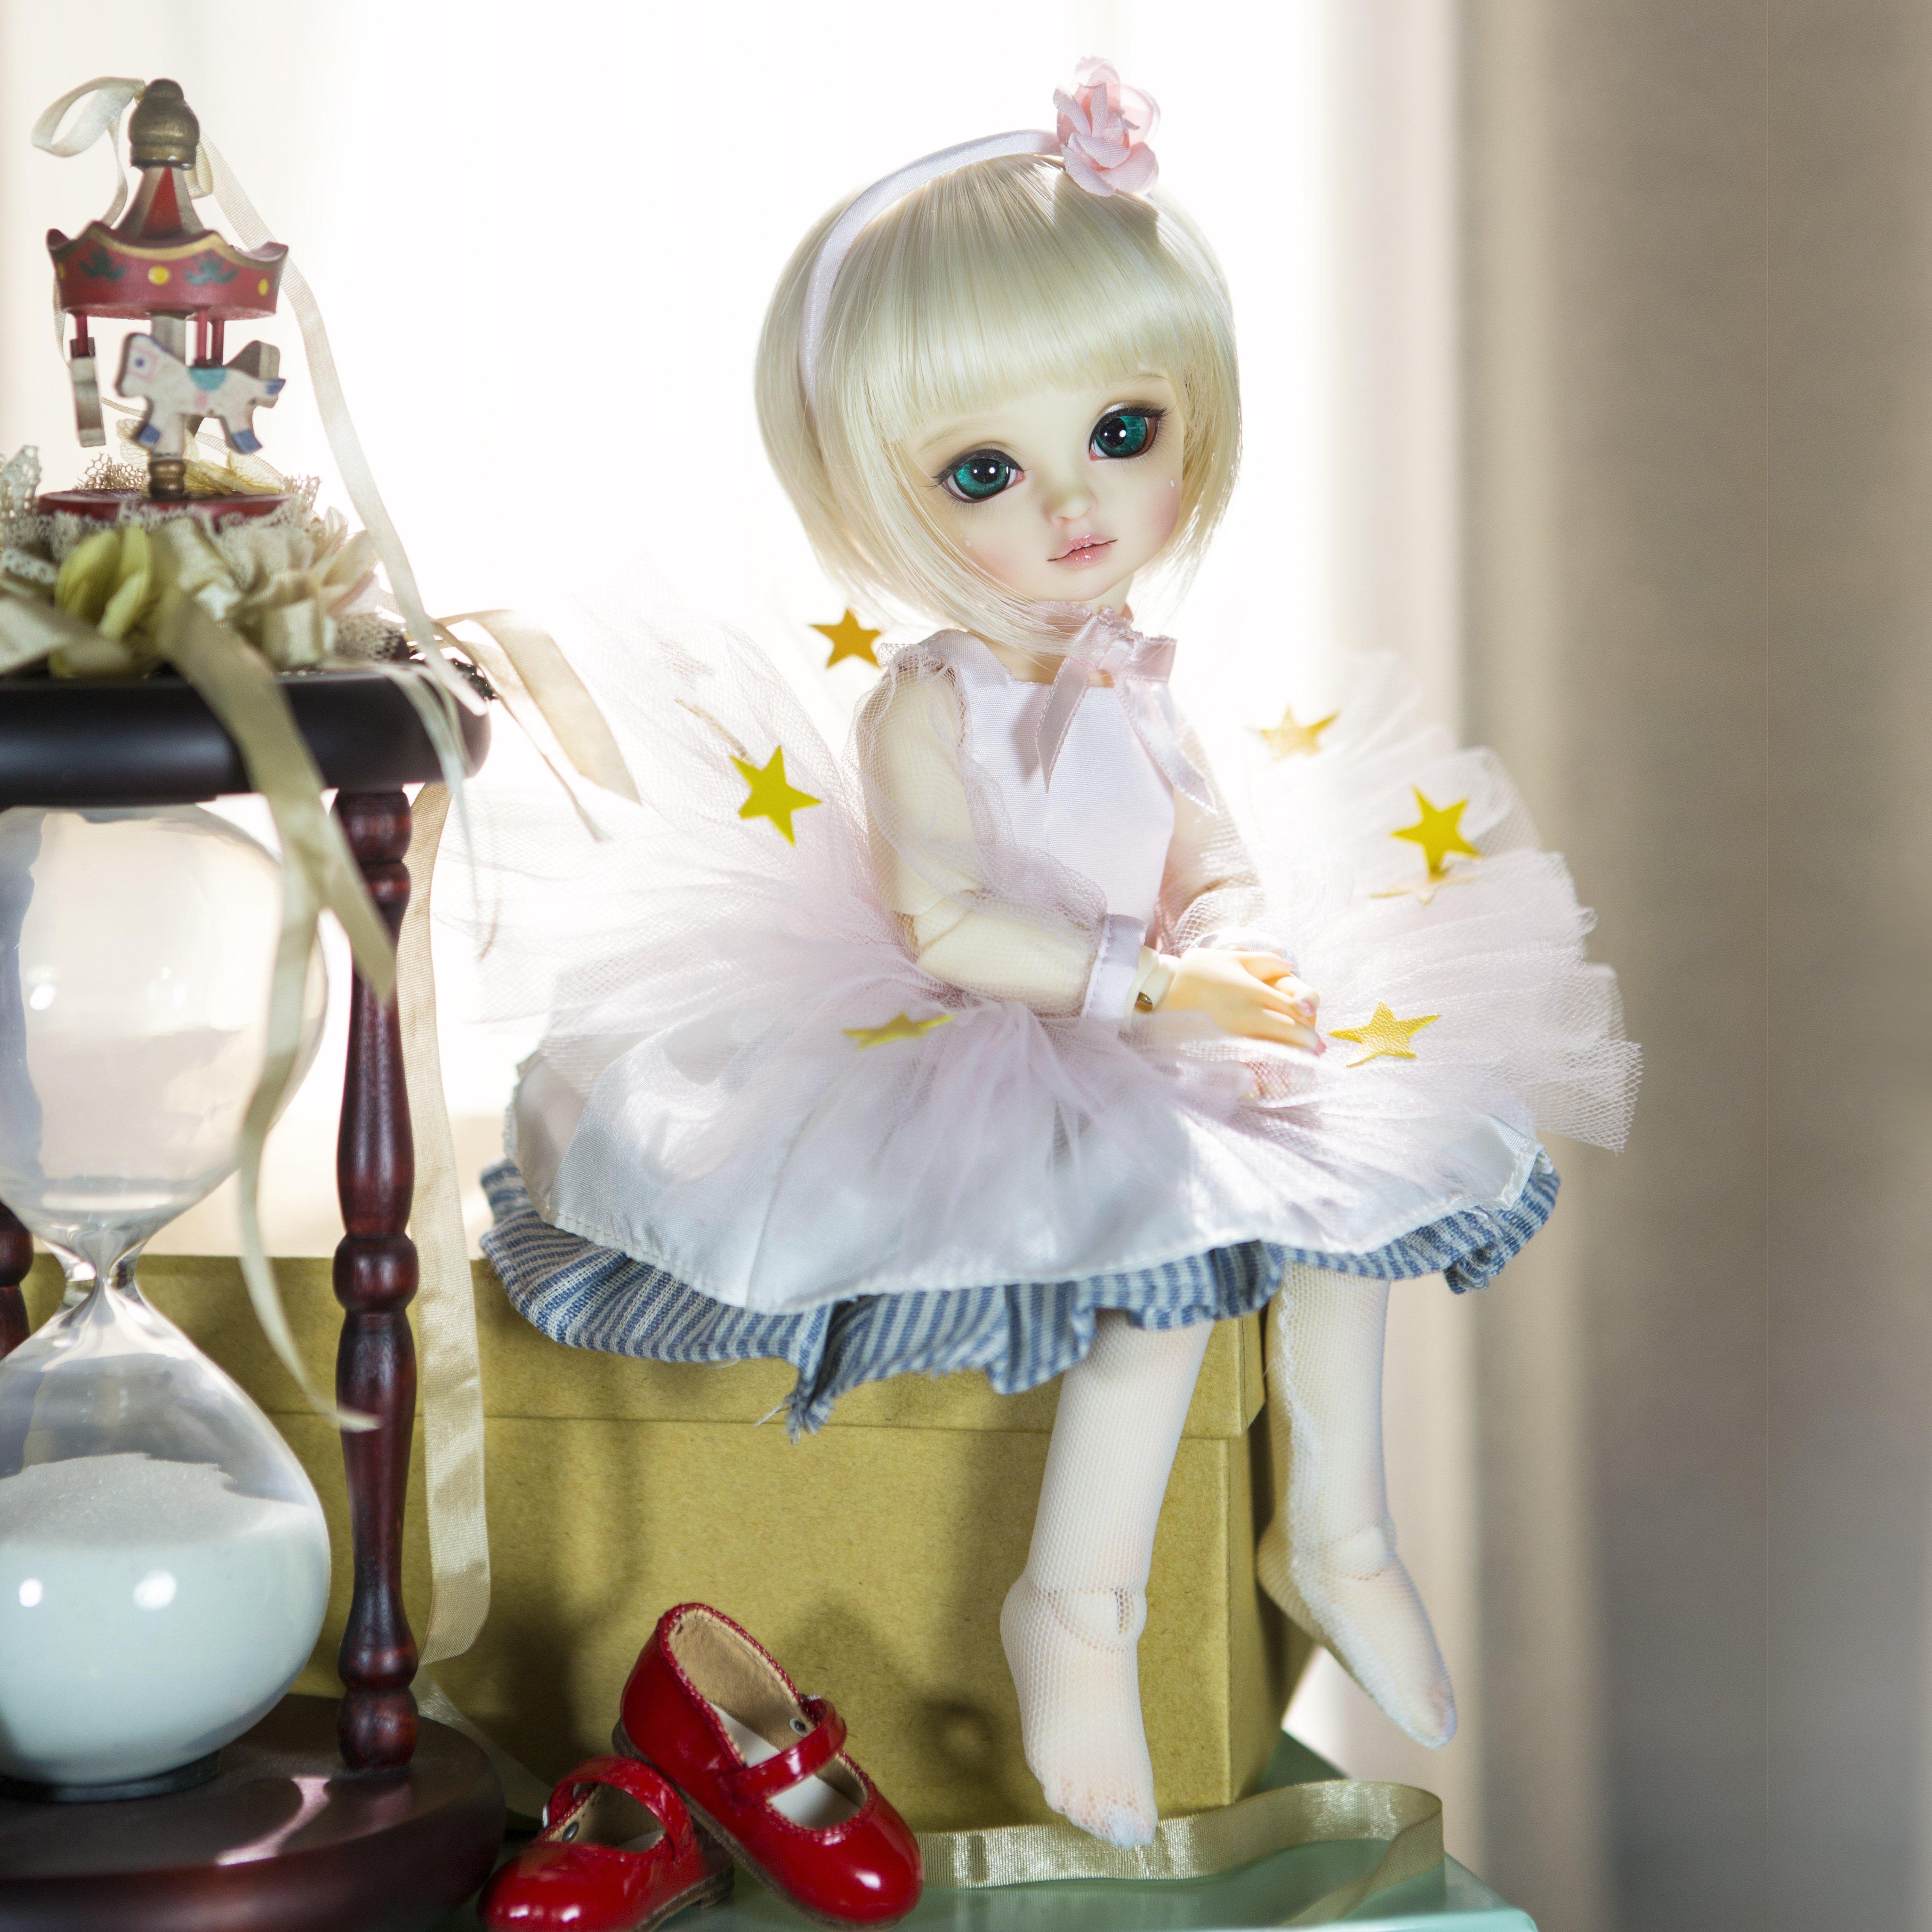 Cute Doll Live Wallpaper: Doll Girl Short Hair Beauty Toys Baby Blonde Cute